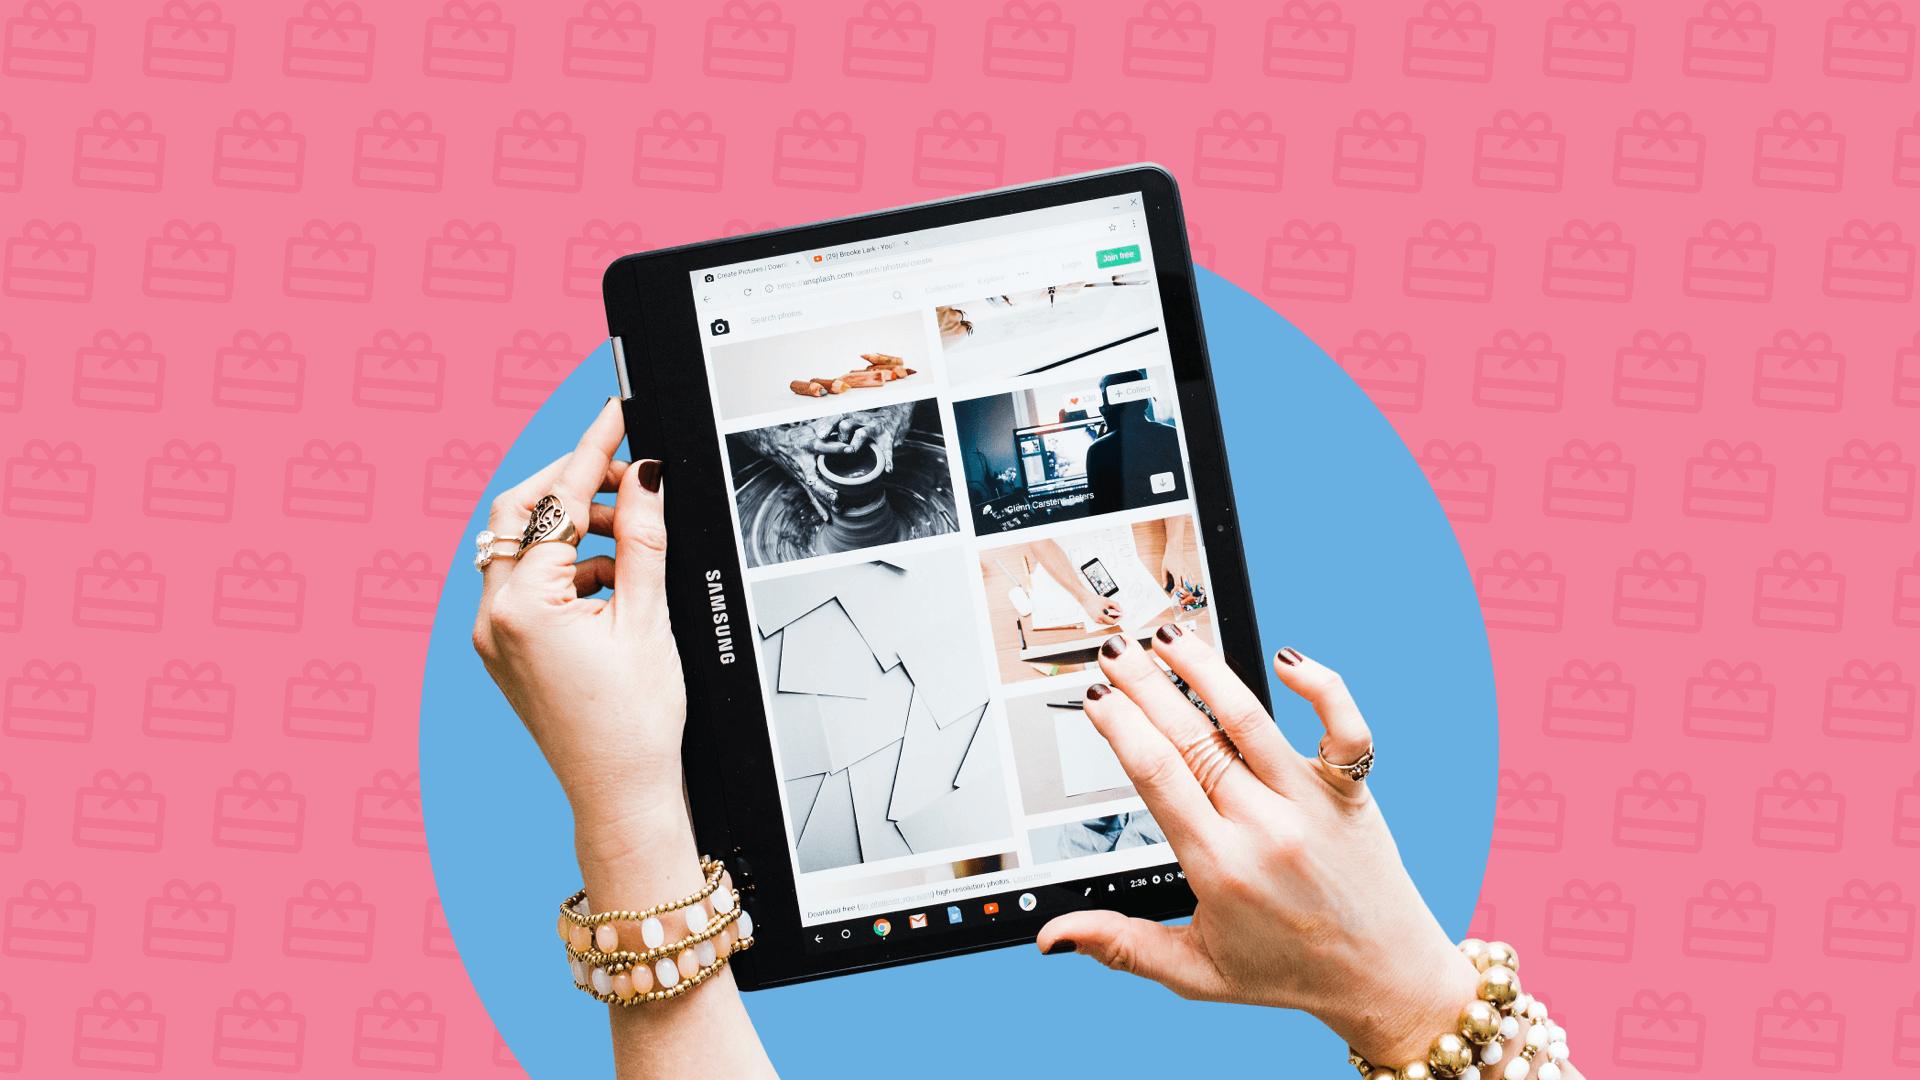 How to Spot an Online Shopping Scam